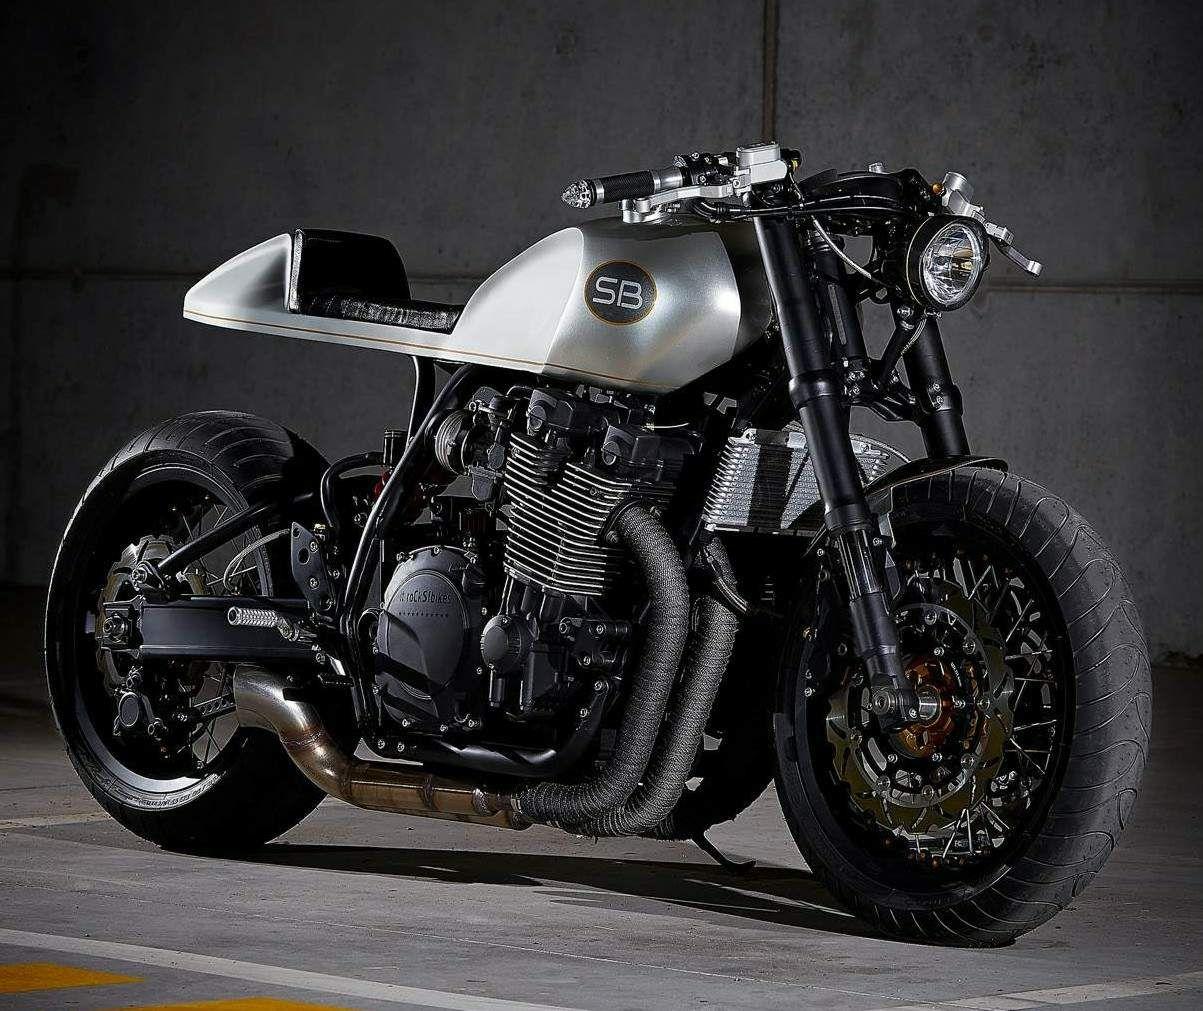 Predator Bmw F800r By Vilner Motorbike Motorcycle Bike Cafe